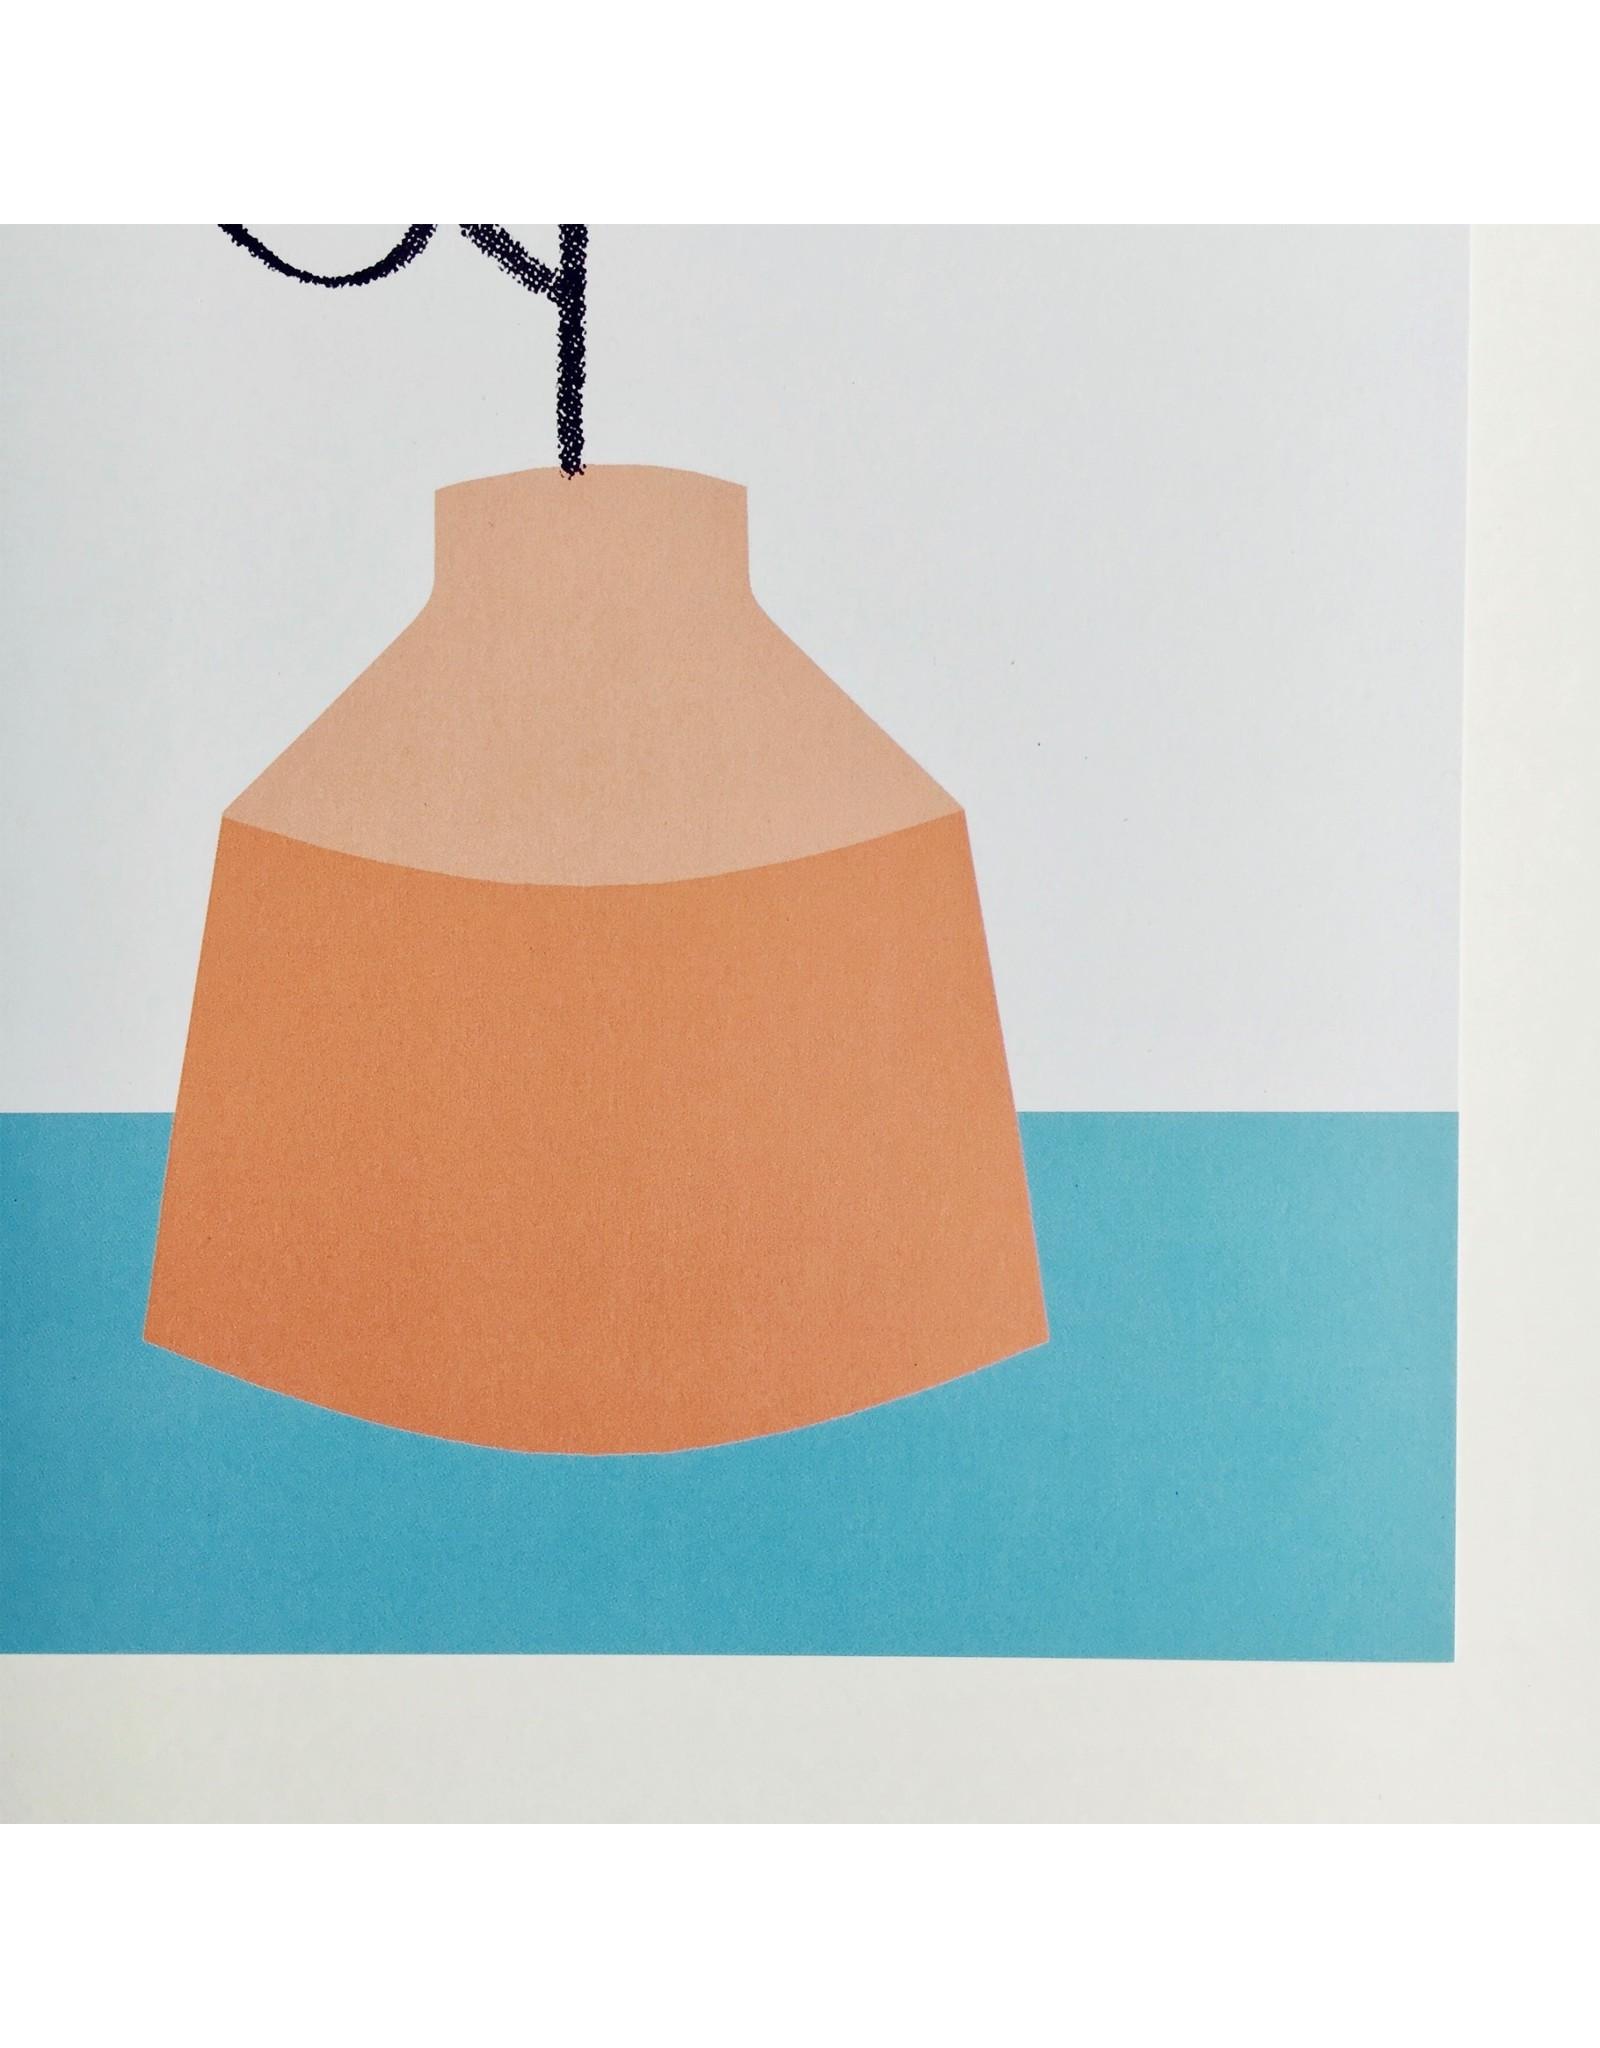 Orange Vase A4 Print